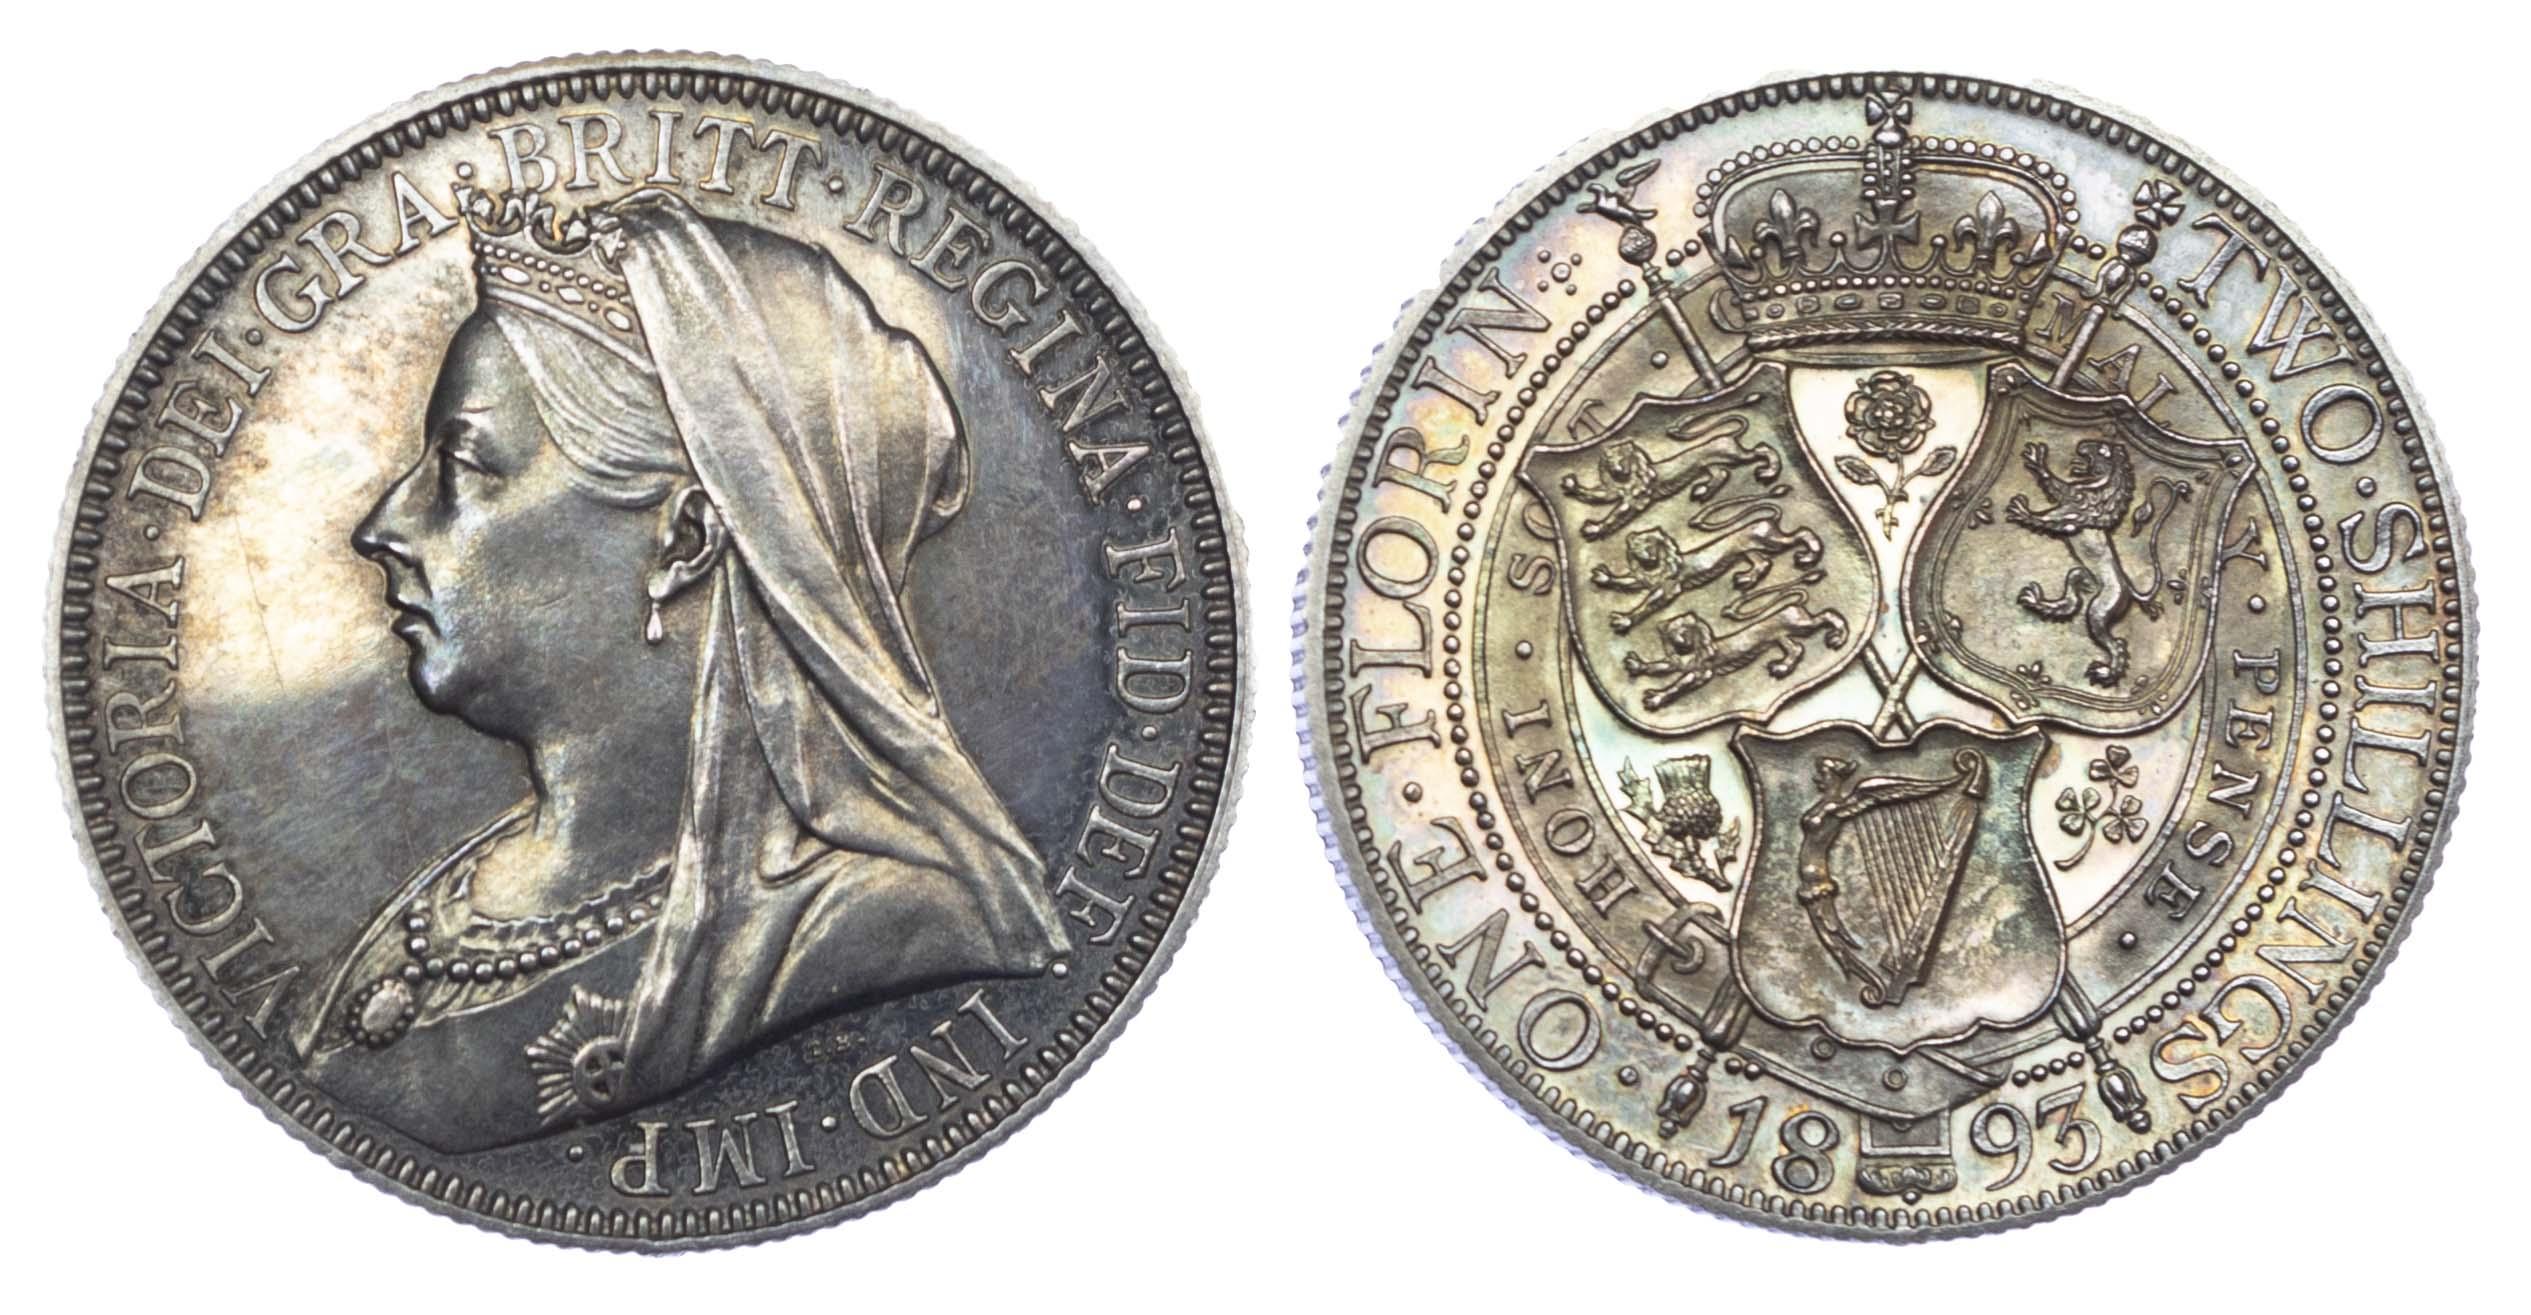 Victoria (1837-1901), Proof Florin, 1893